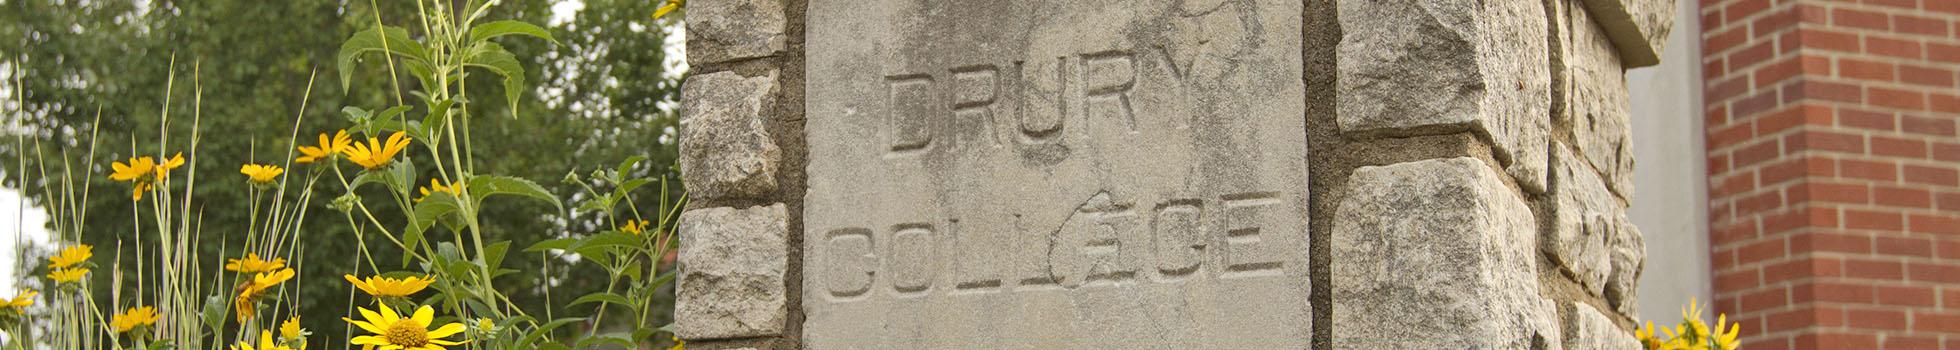 Drury College cornerstone.